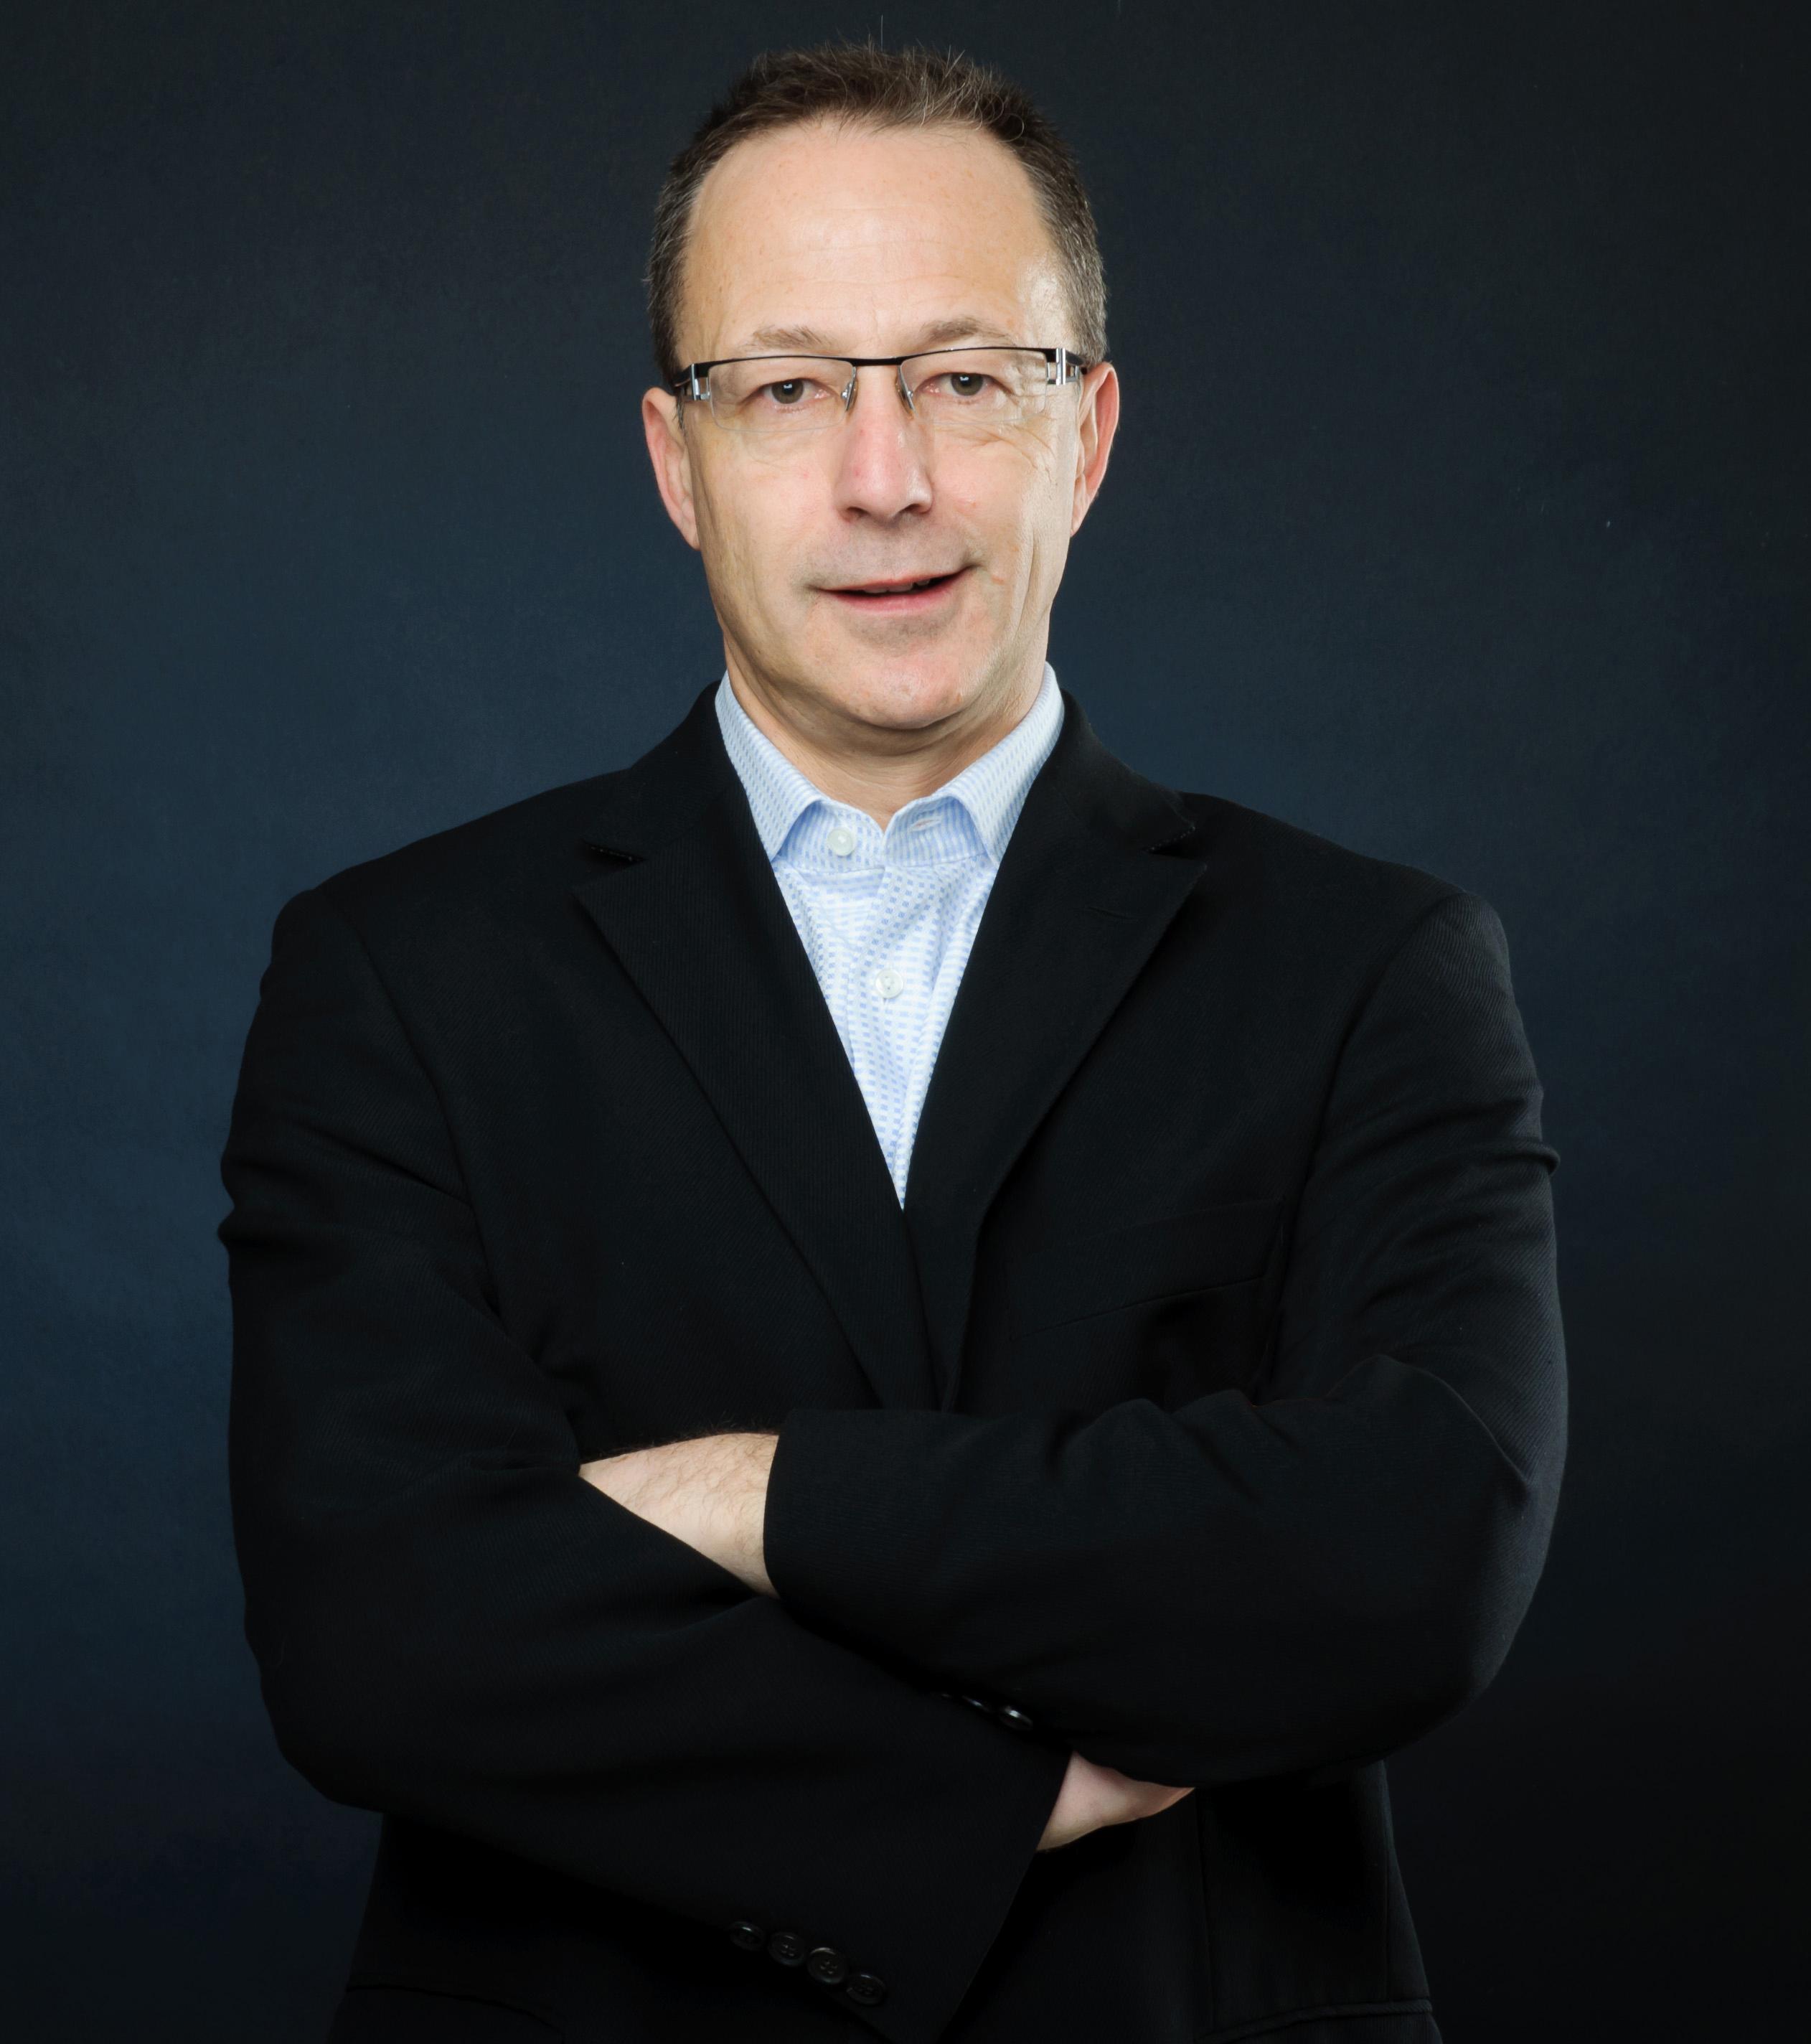 Gary Kalk